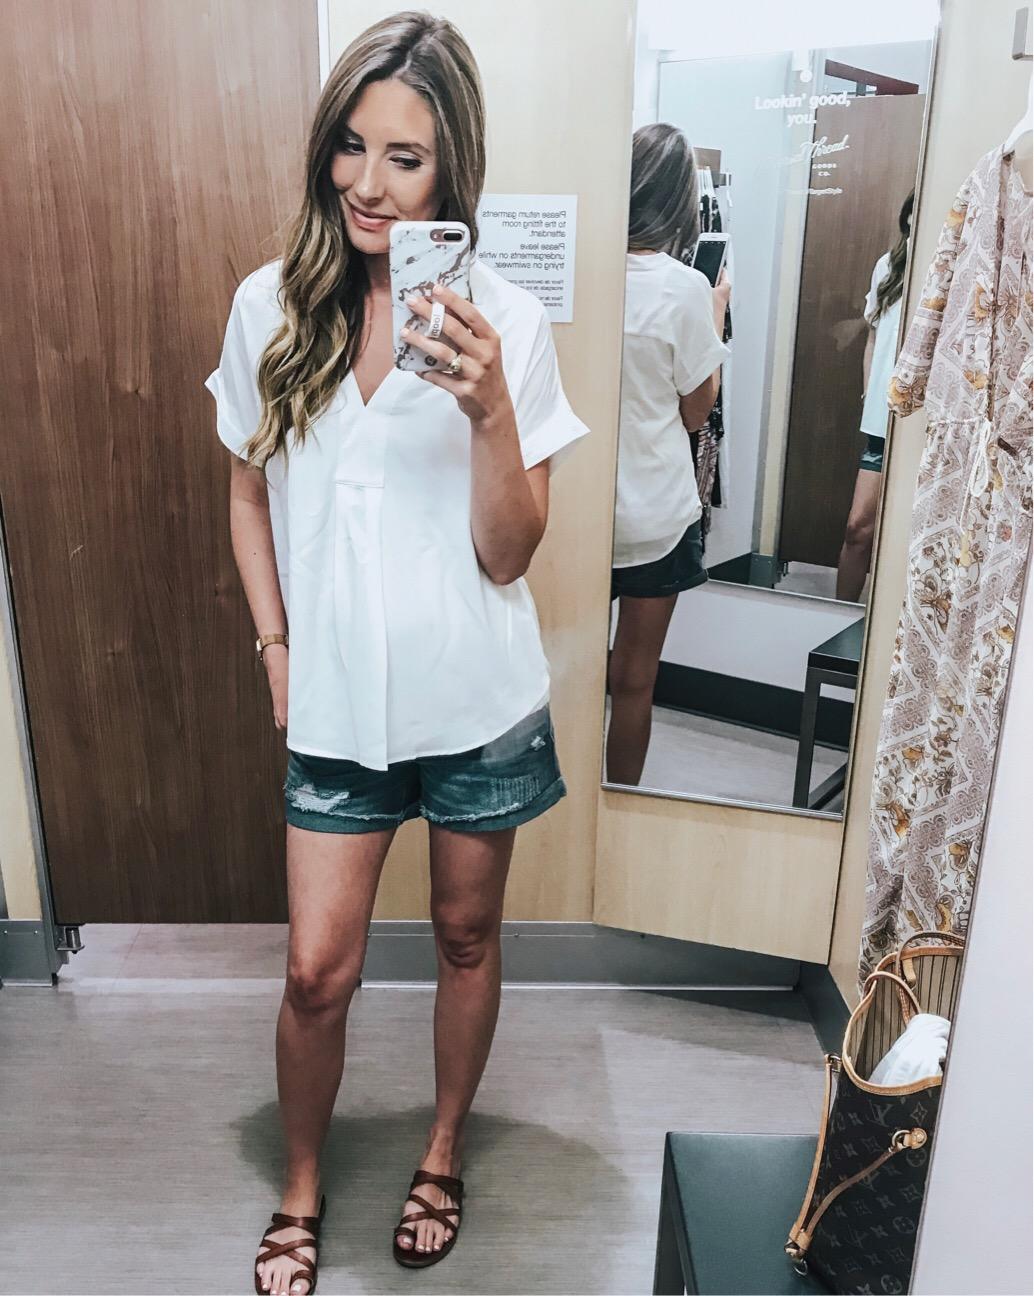 White Top, Denim Shorts - Megan Kristine